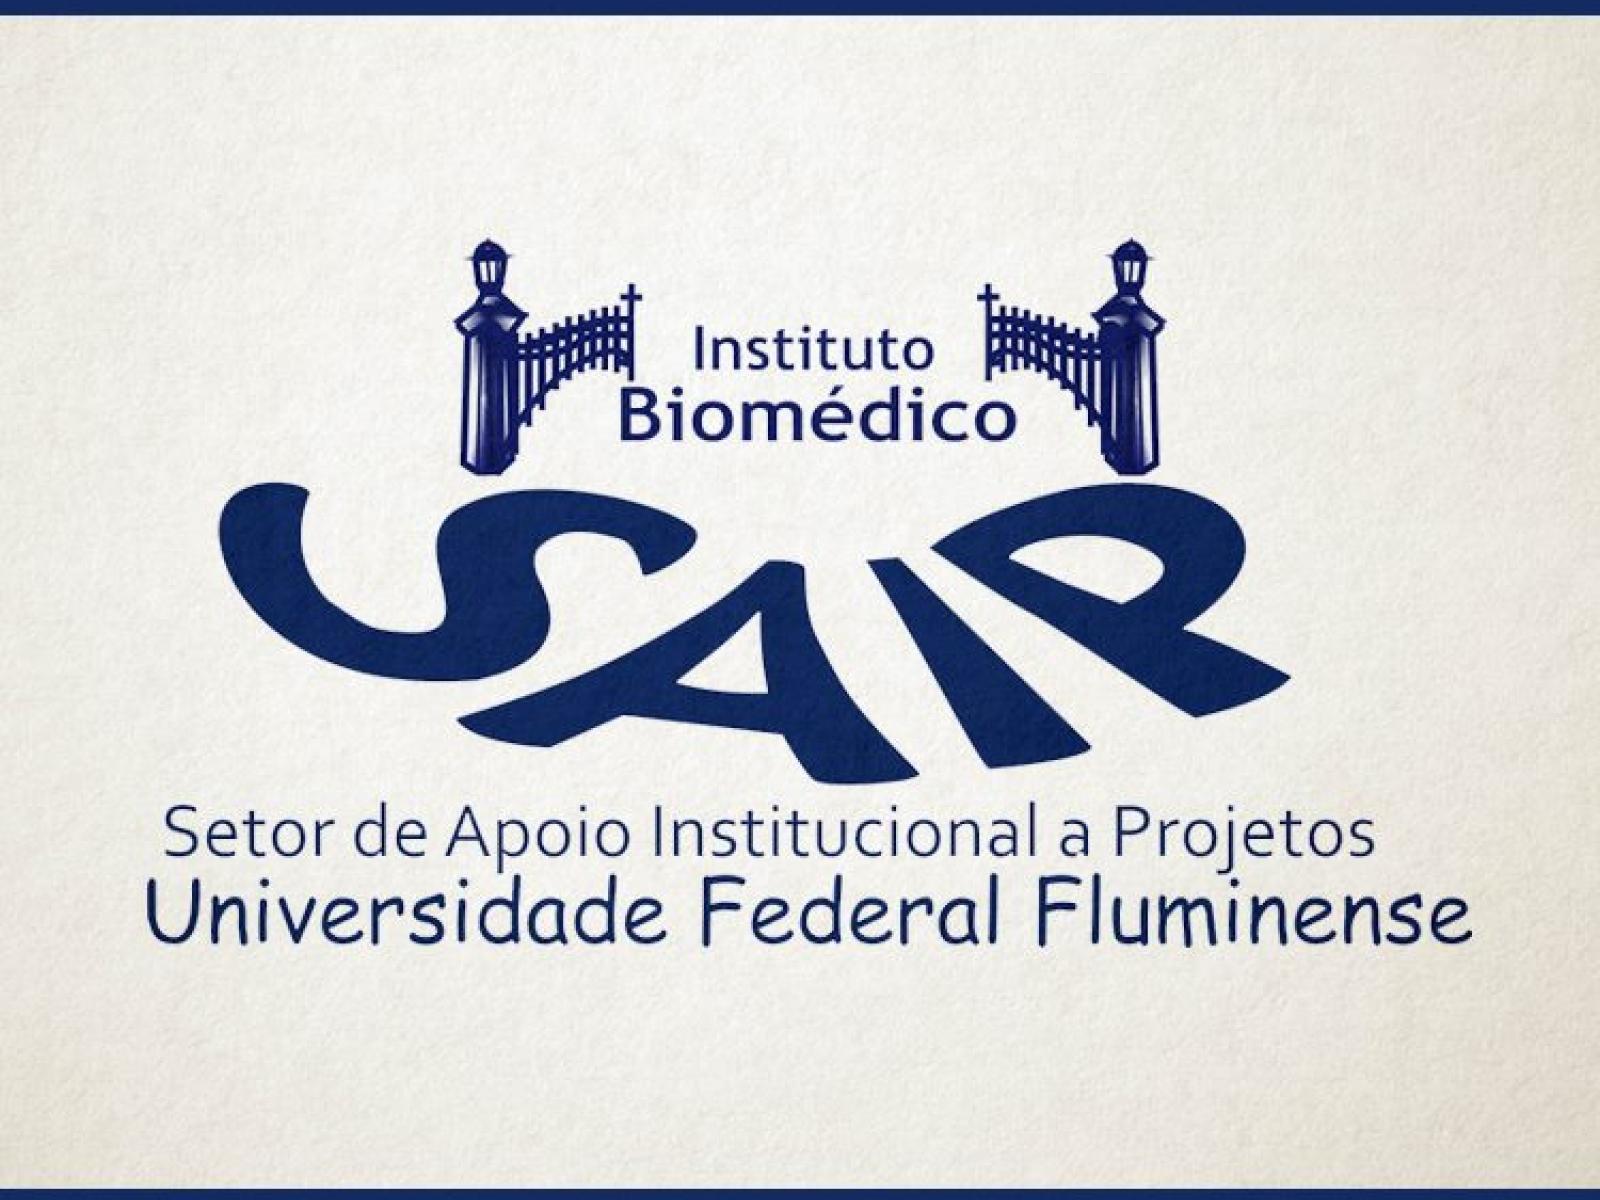 www.saip.sites.uff.br